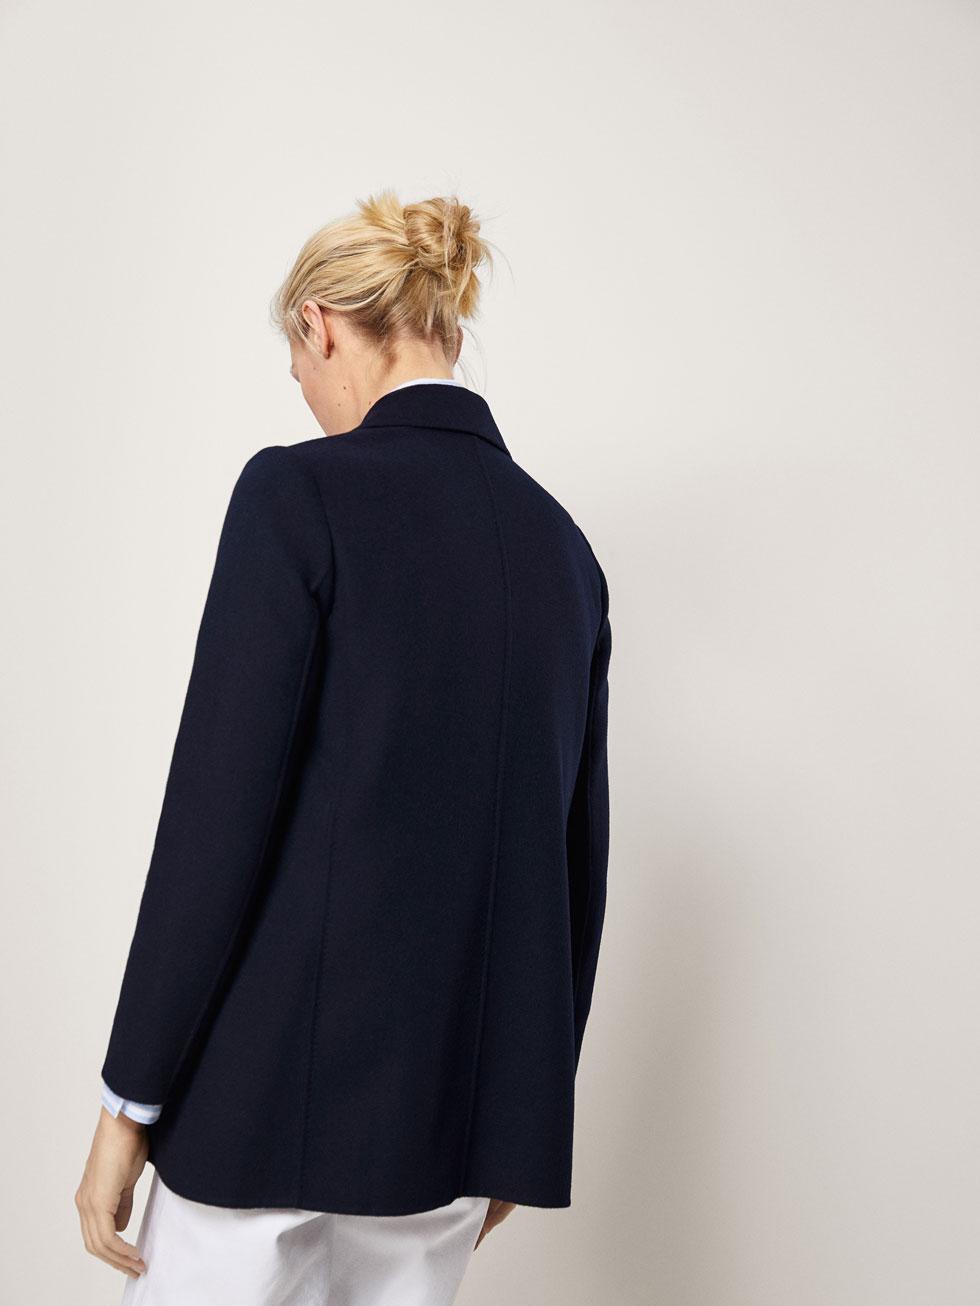 Favorite NAVY BLUE WOOL COAT - Women - Massimo Dutti EA86